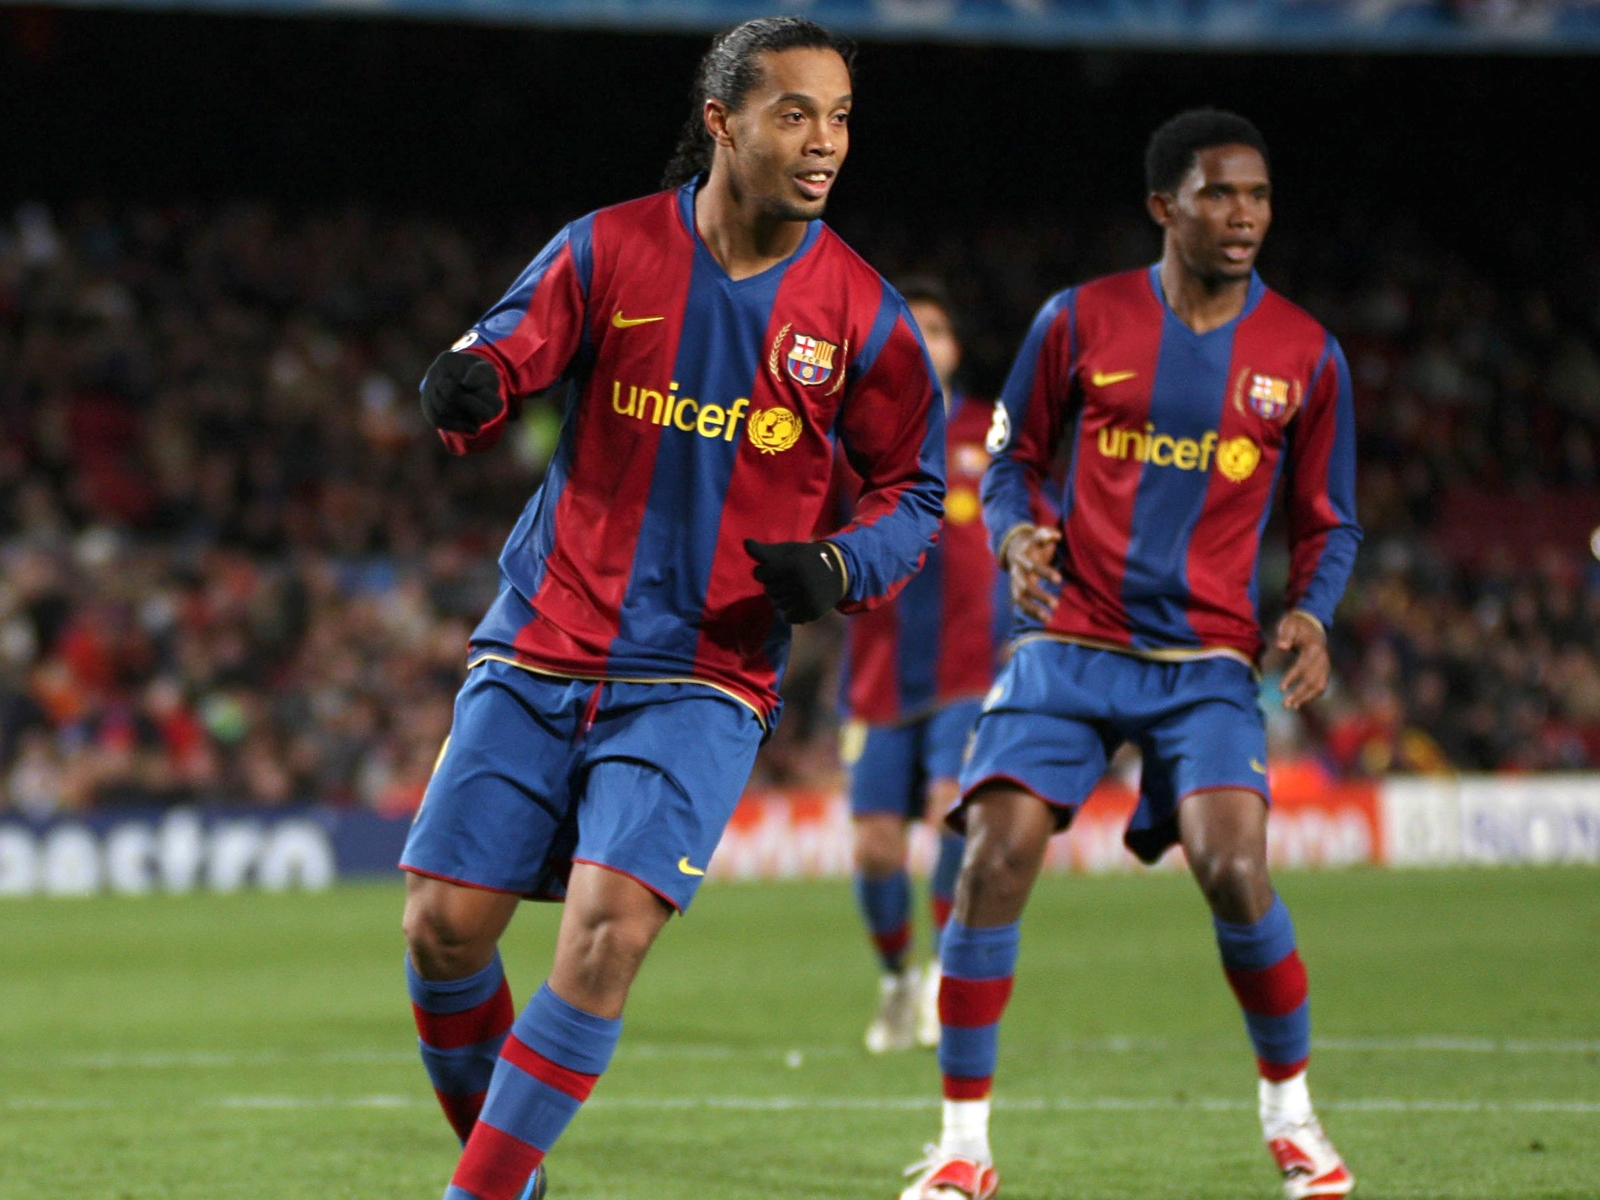 Eto'o Sends Emotional Message To Ronaldinho In Jail